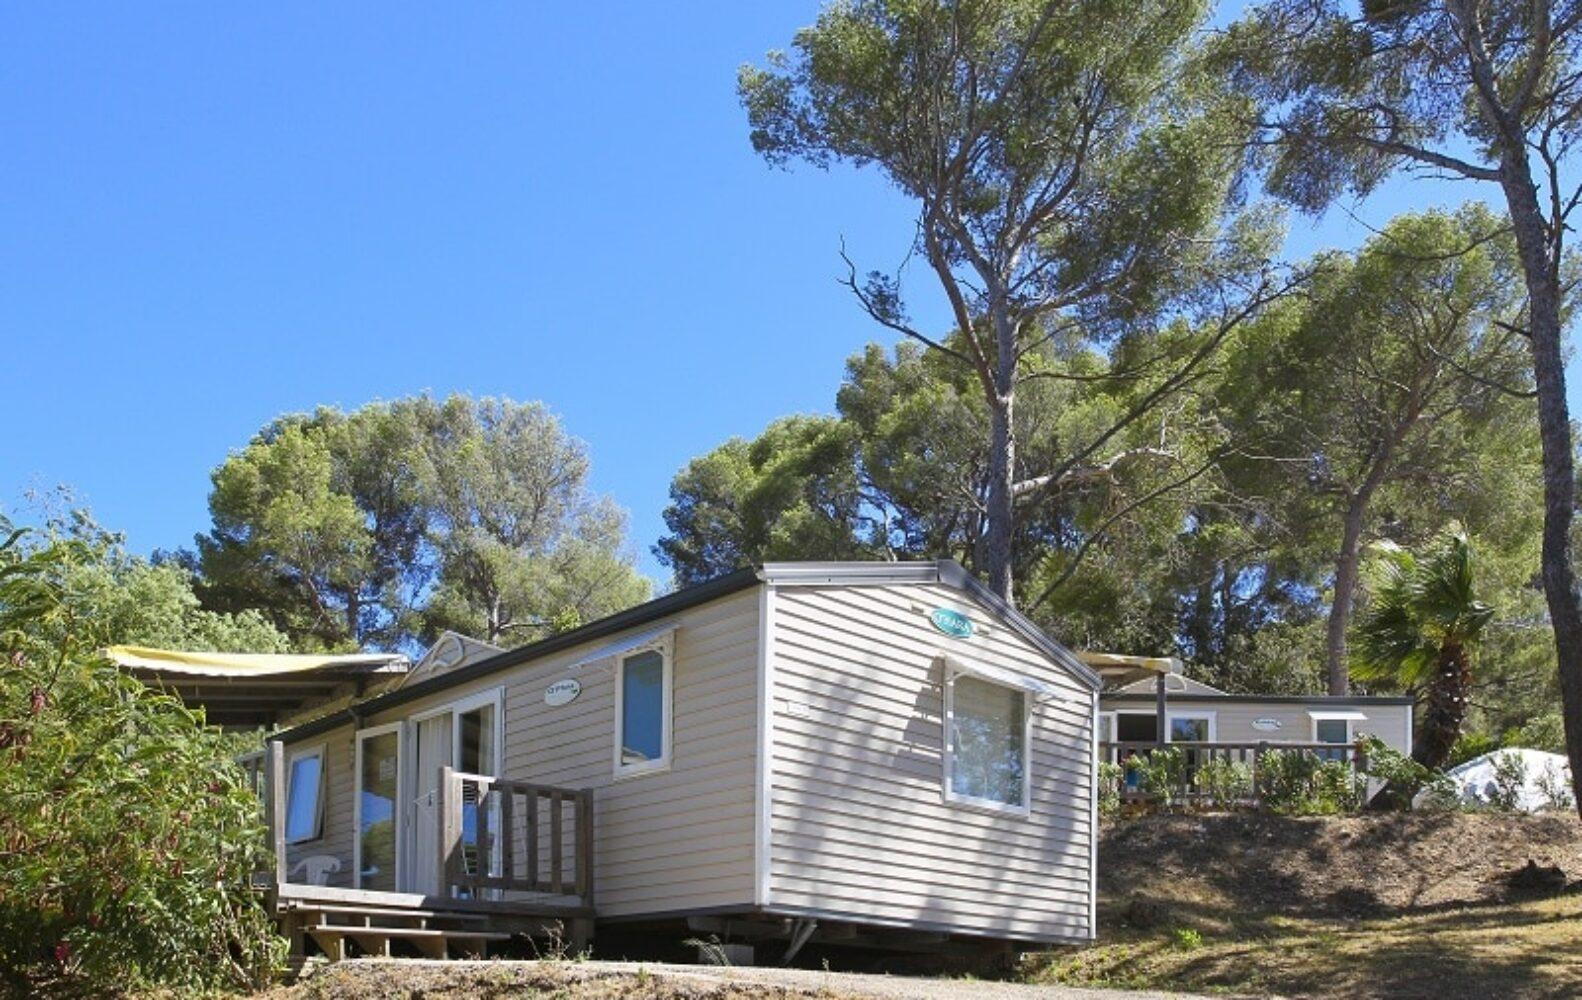 Star-camp-du-domaine800